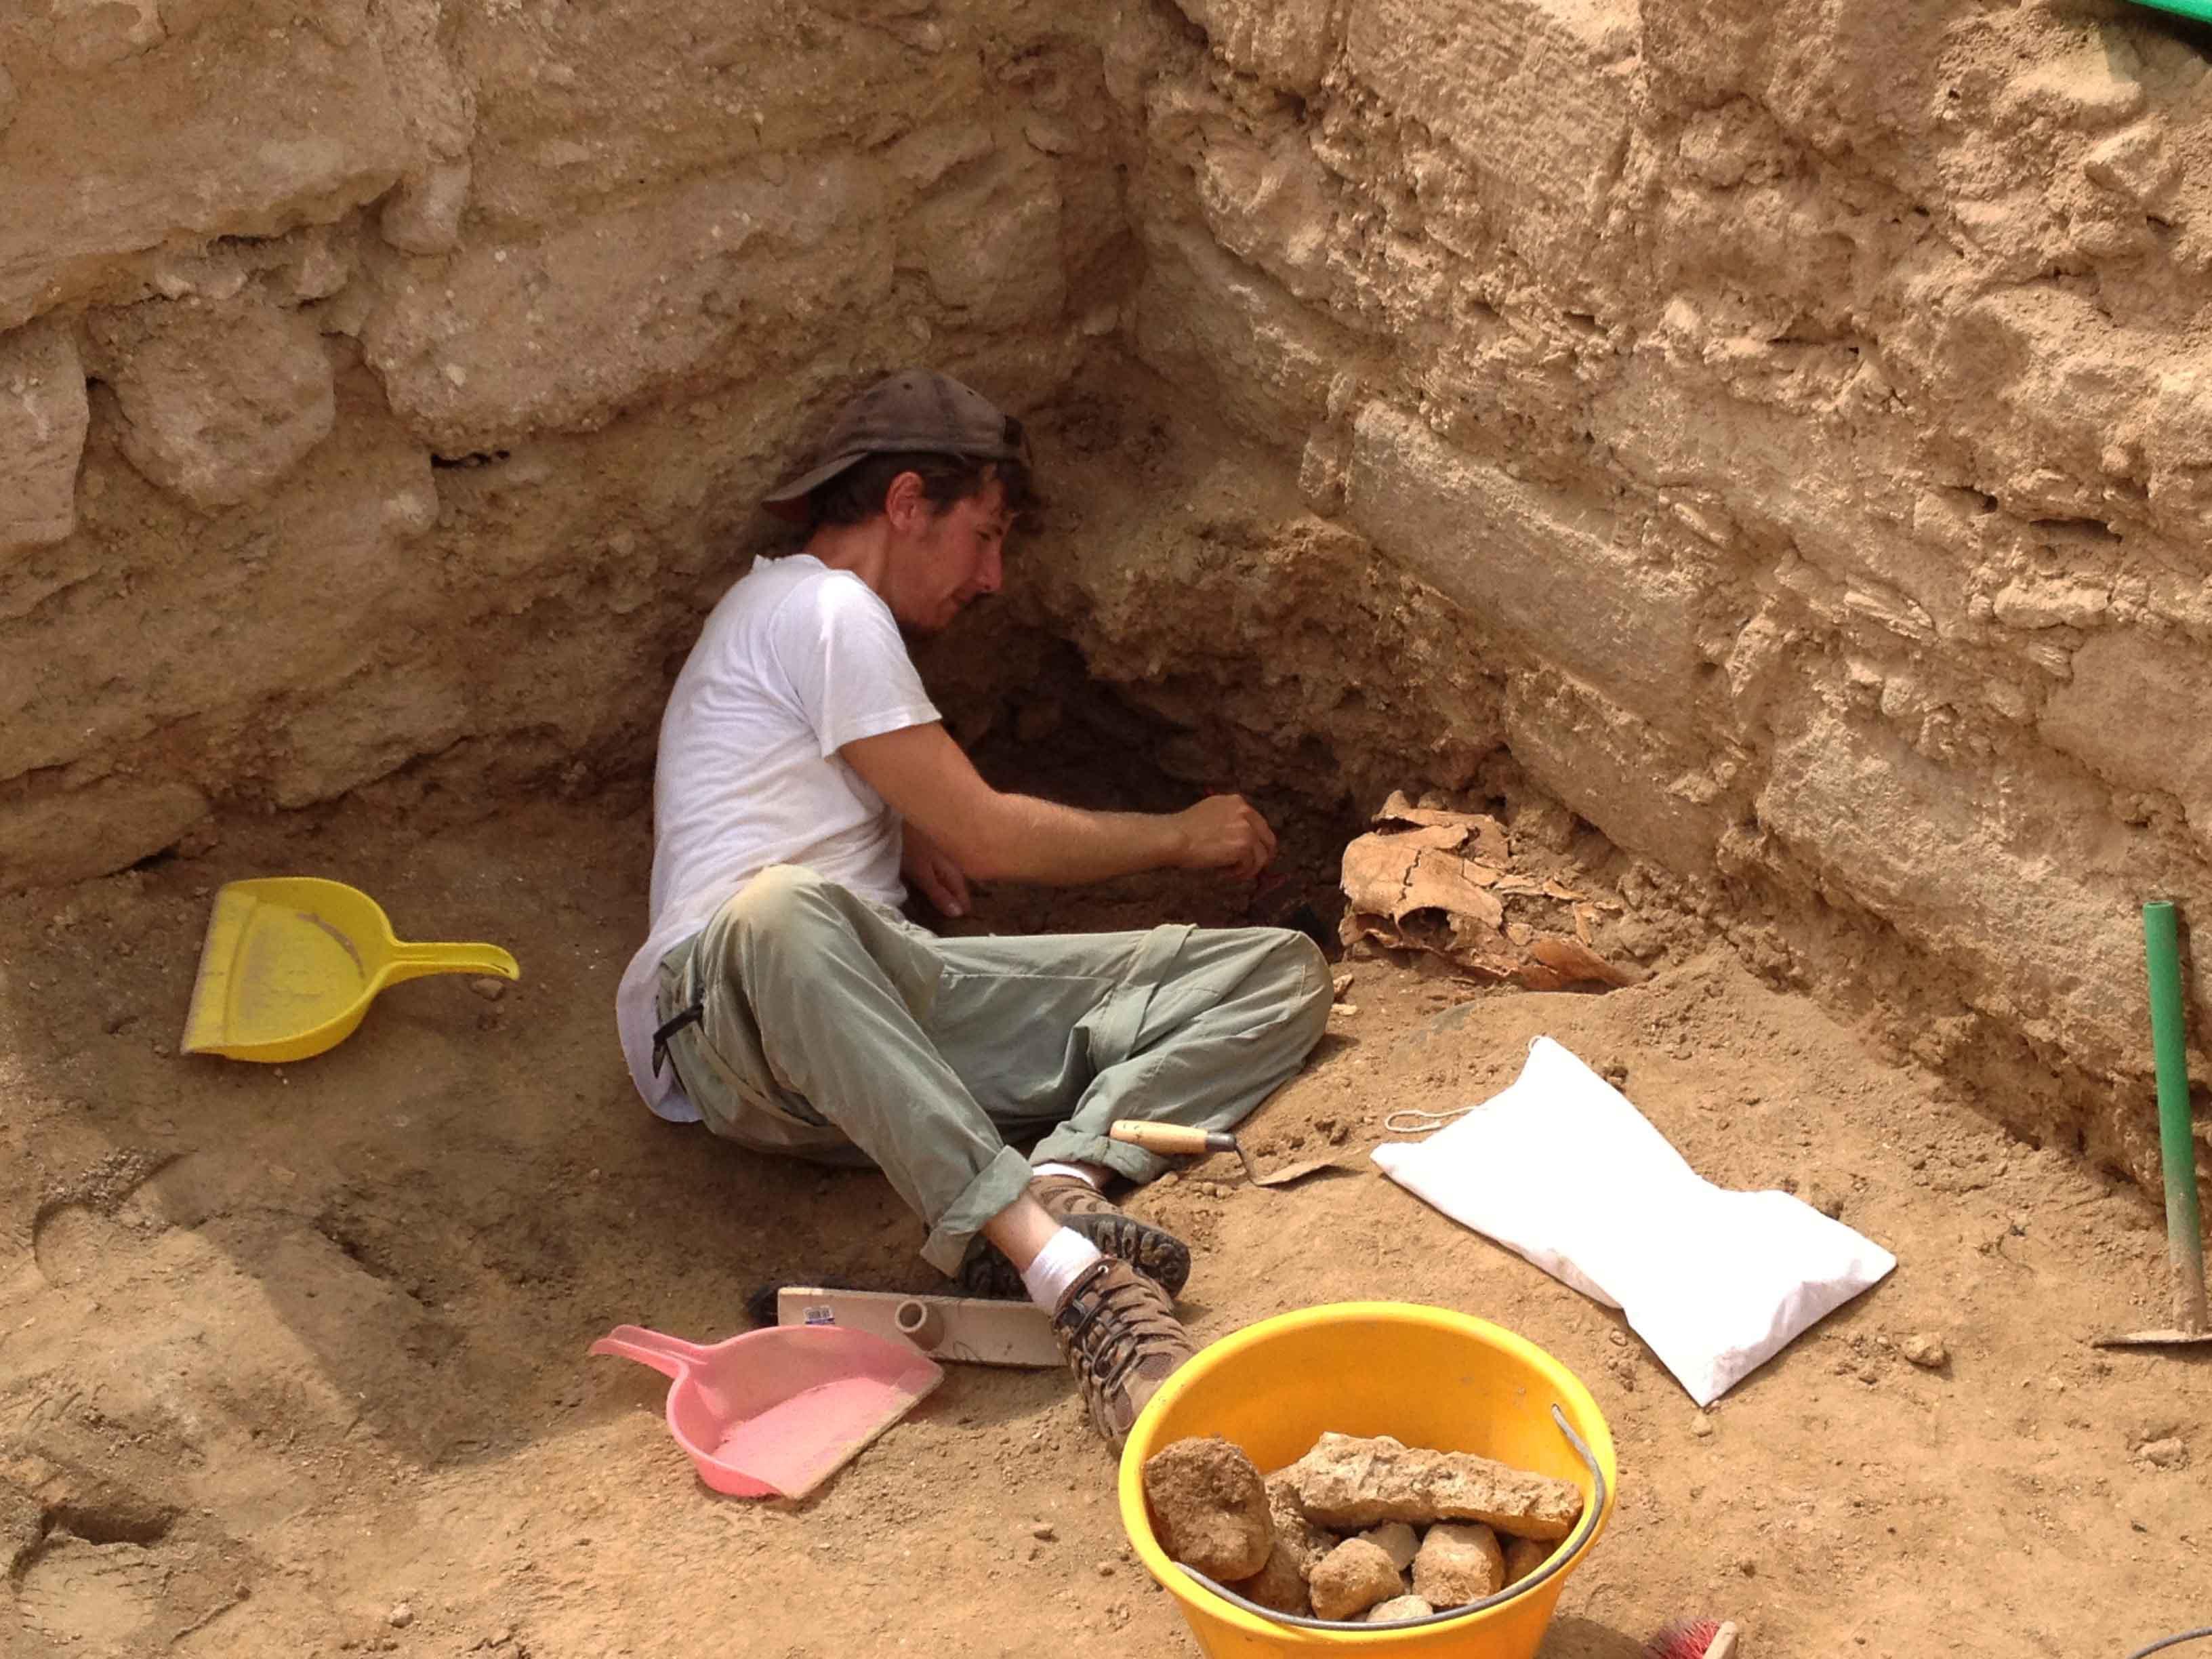 arheologiya.jpg (413.7 Kb)